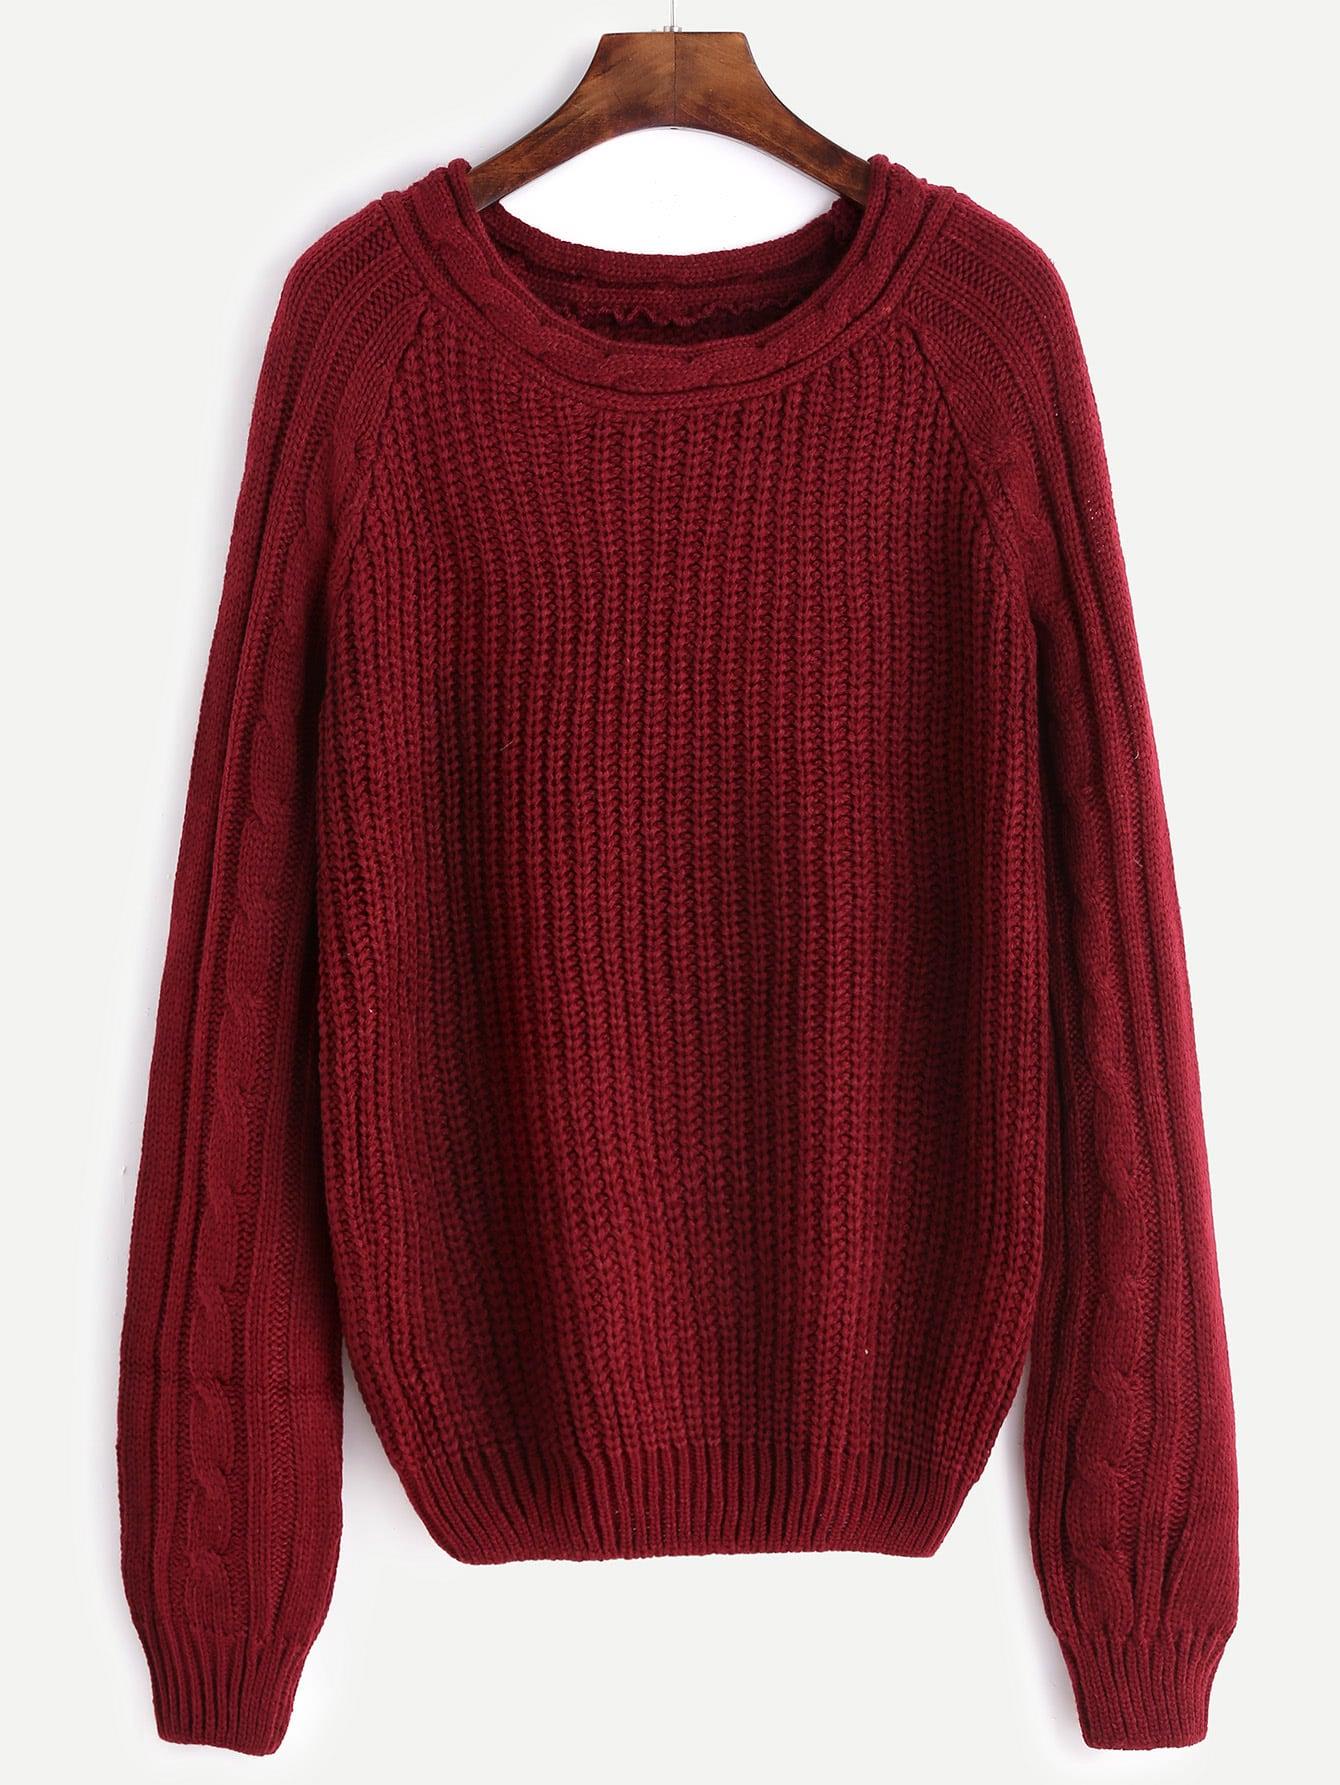 Burgundy Mixed Knit Raglan Sleeve Sweater sweater161021462